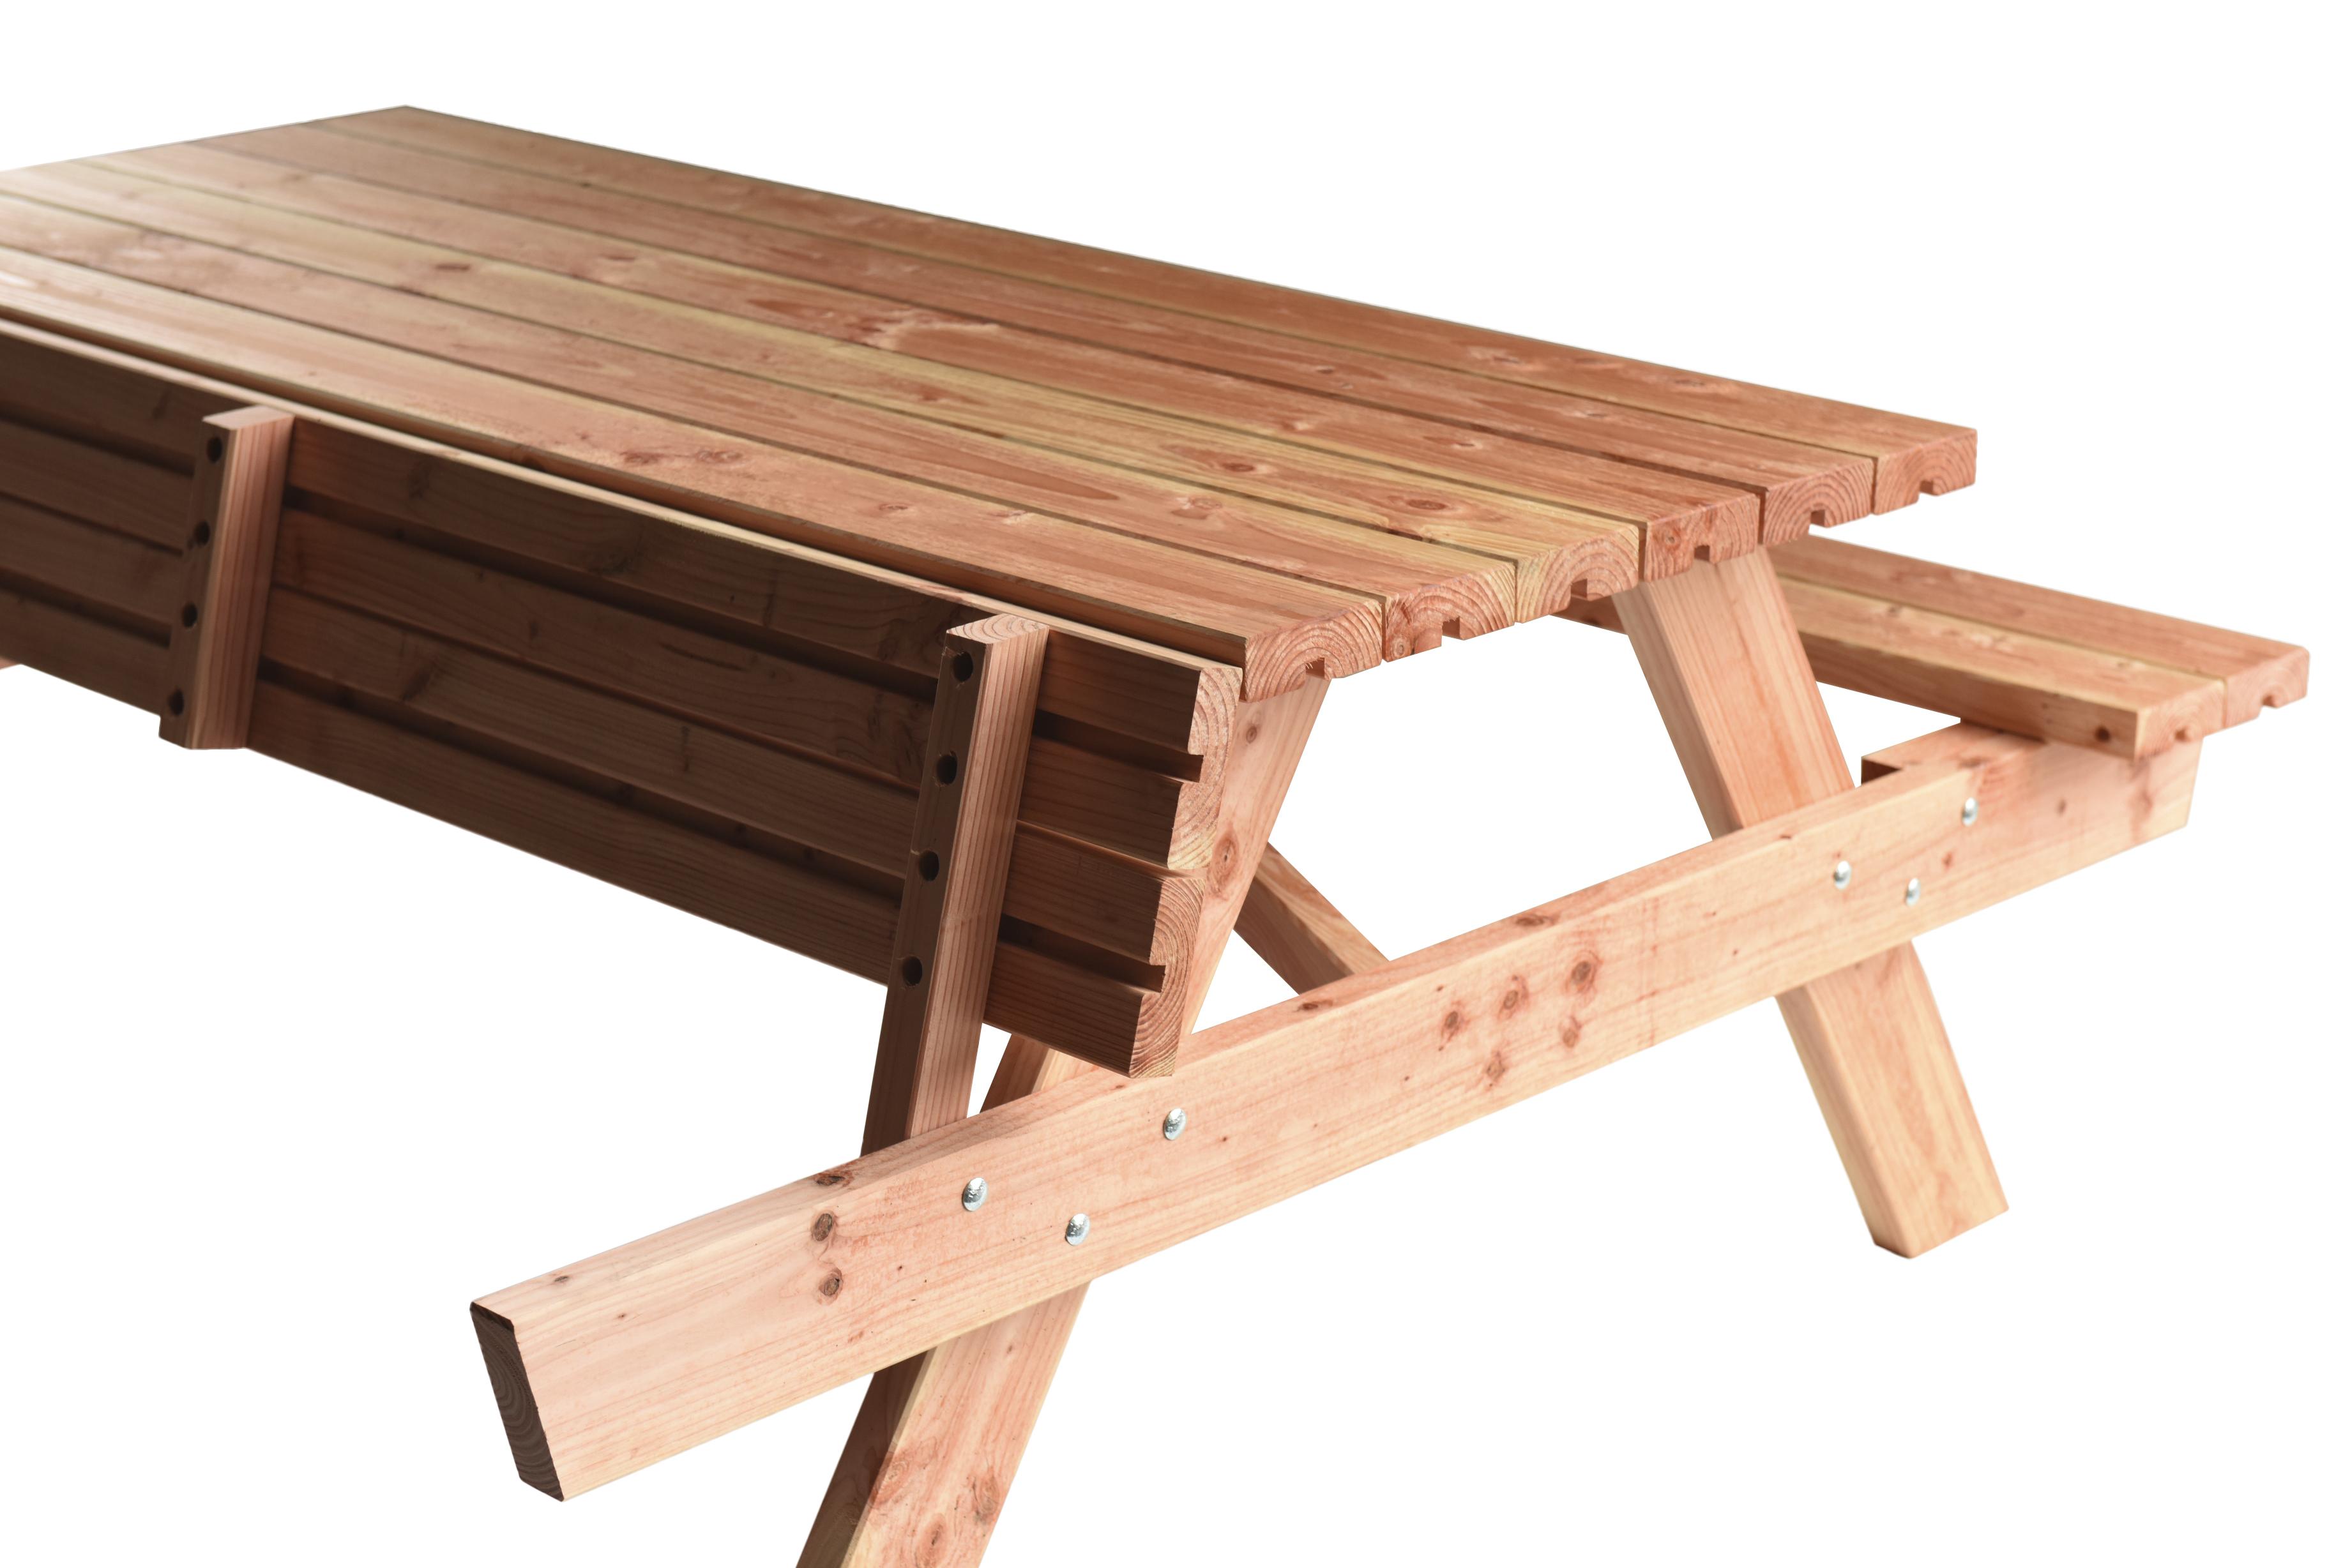 Douglas picknicktafel opklapbaar 11009